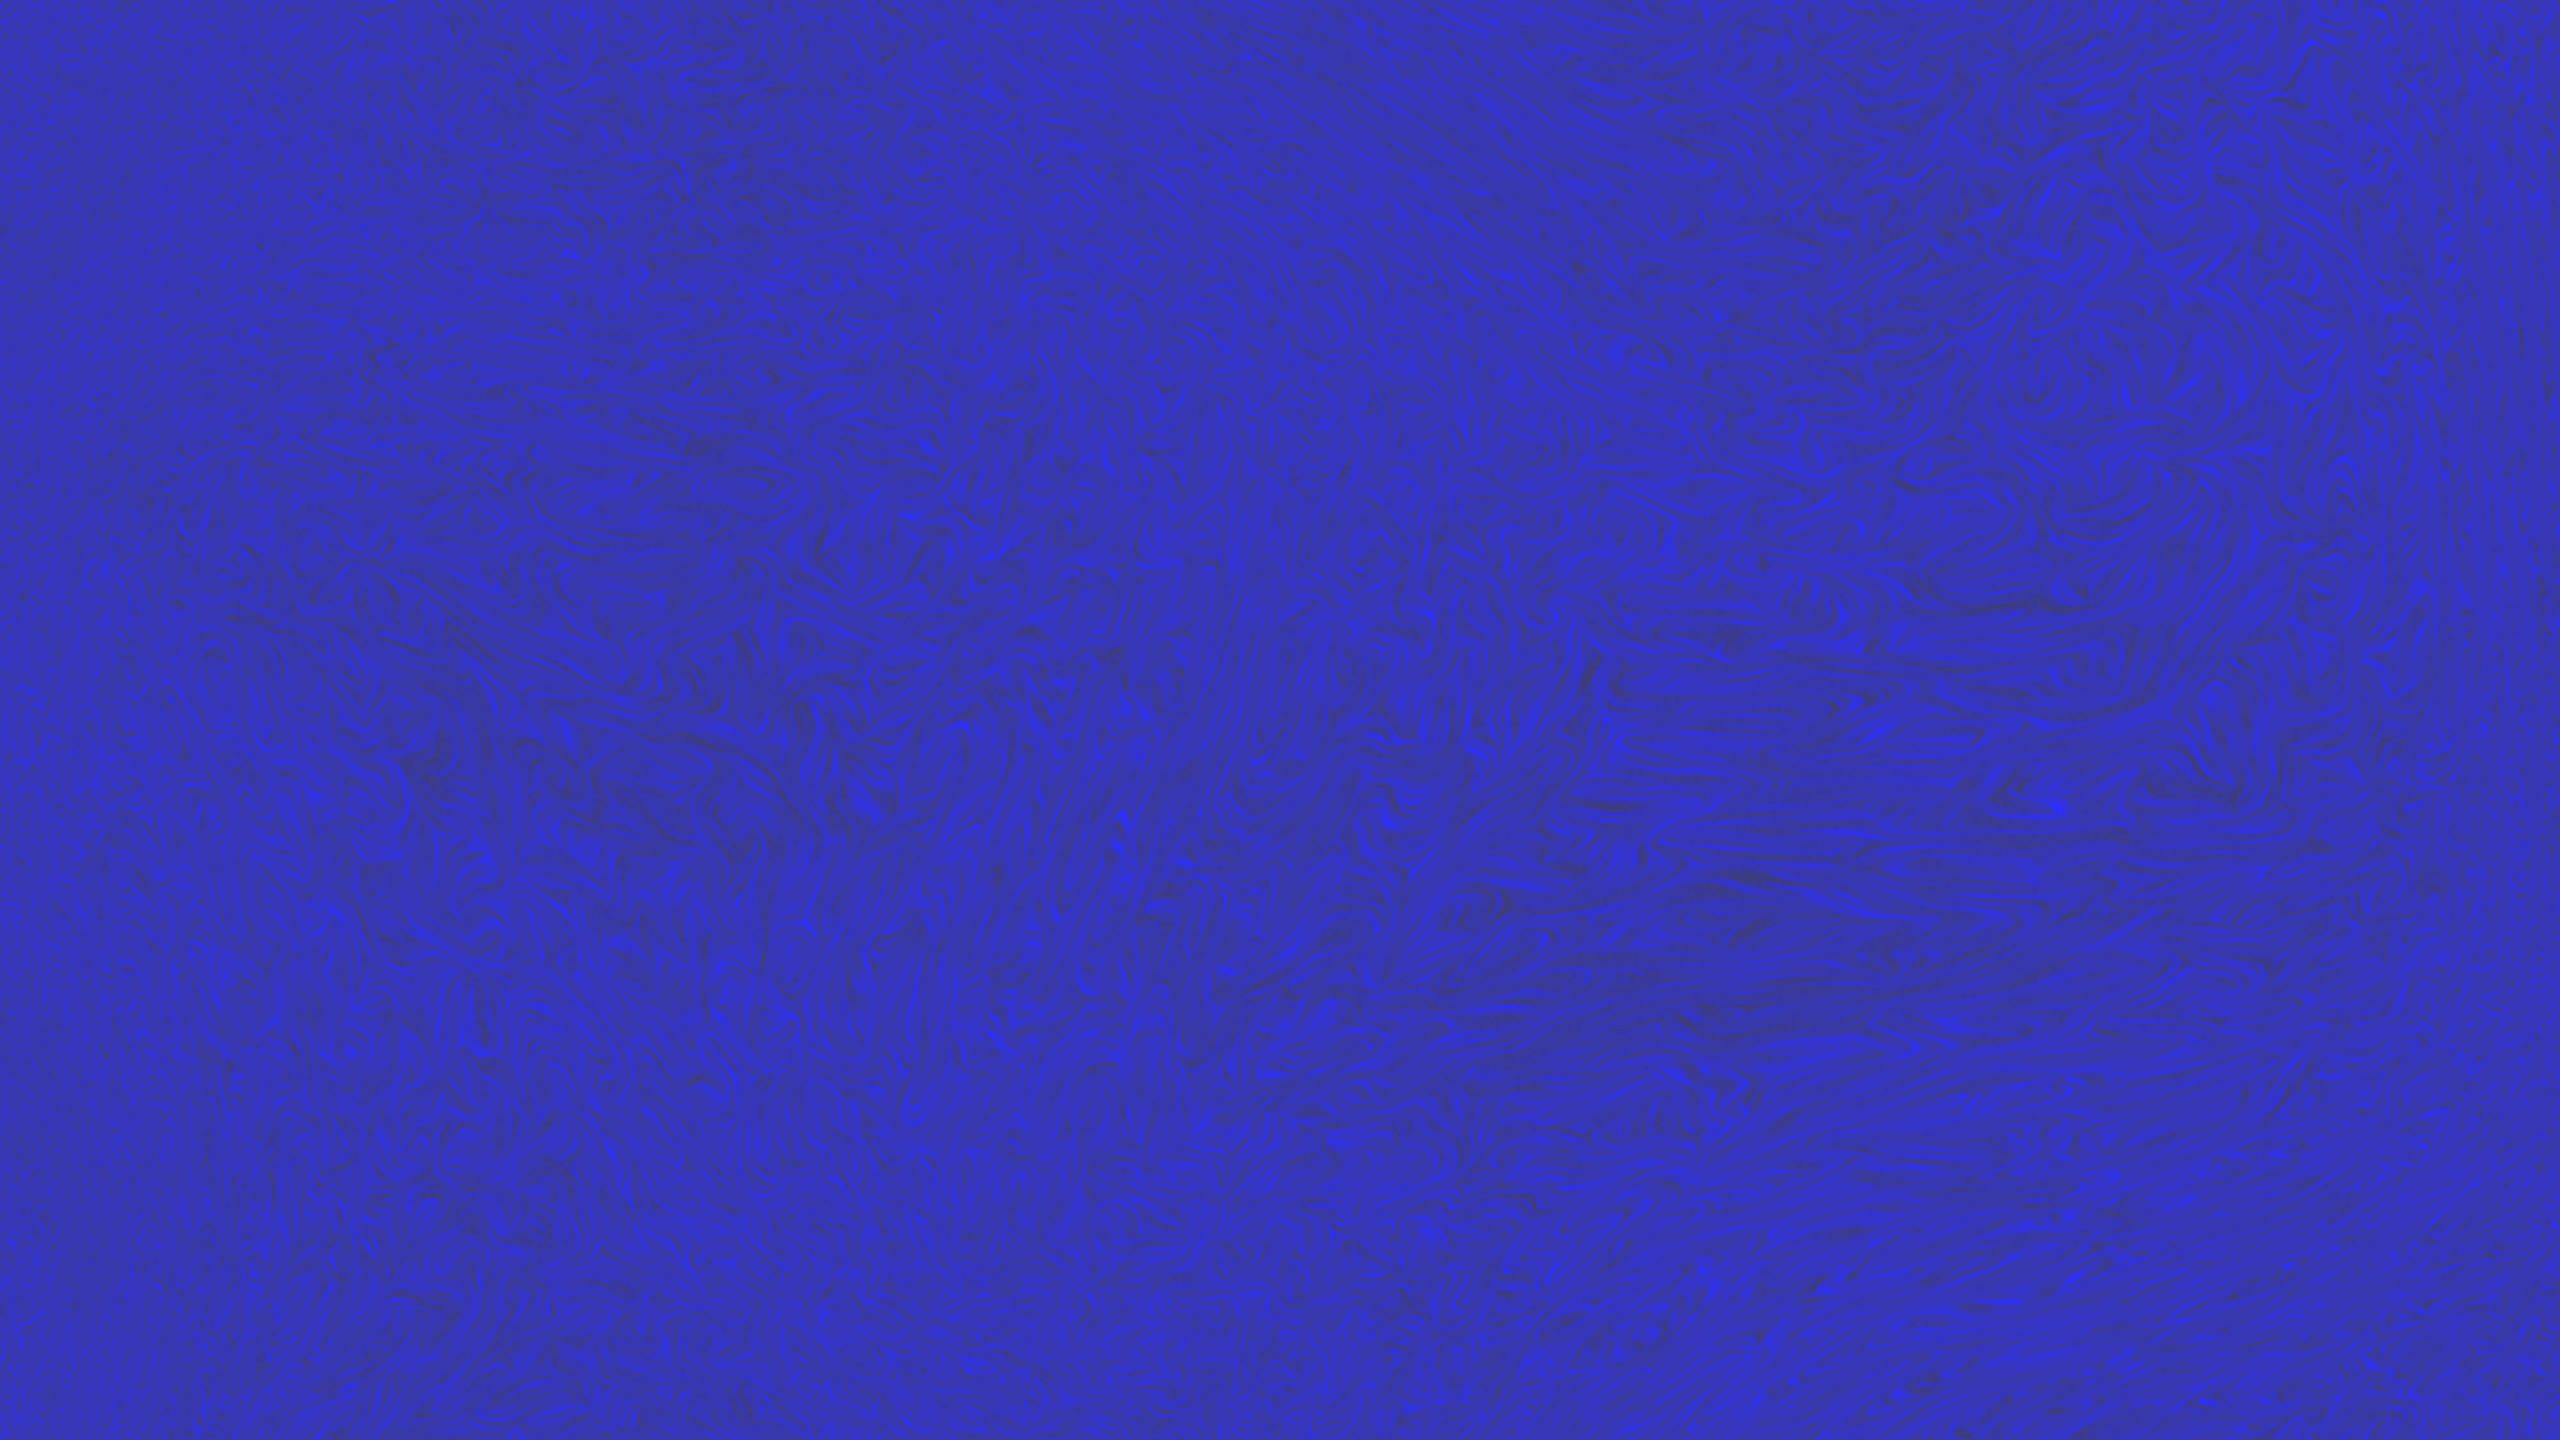 blue-texture-background